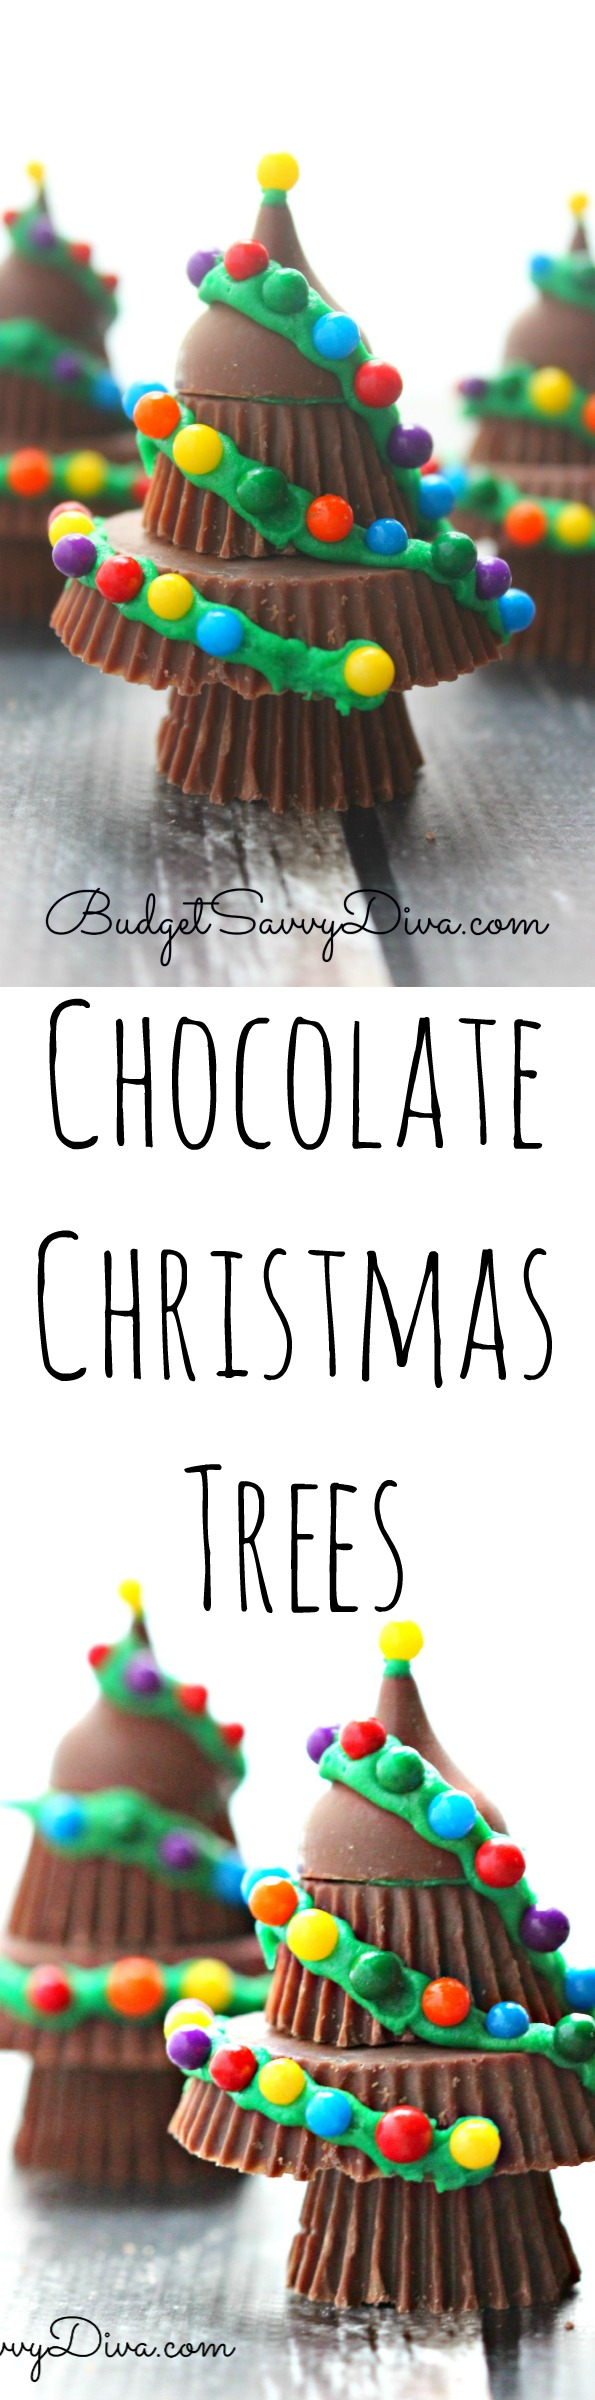 Chocolate Christmas Trees Recipe | Budget Savvy Diva